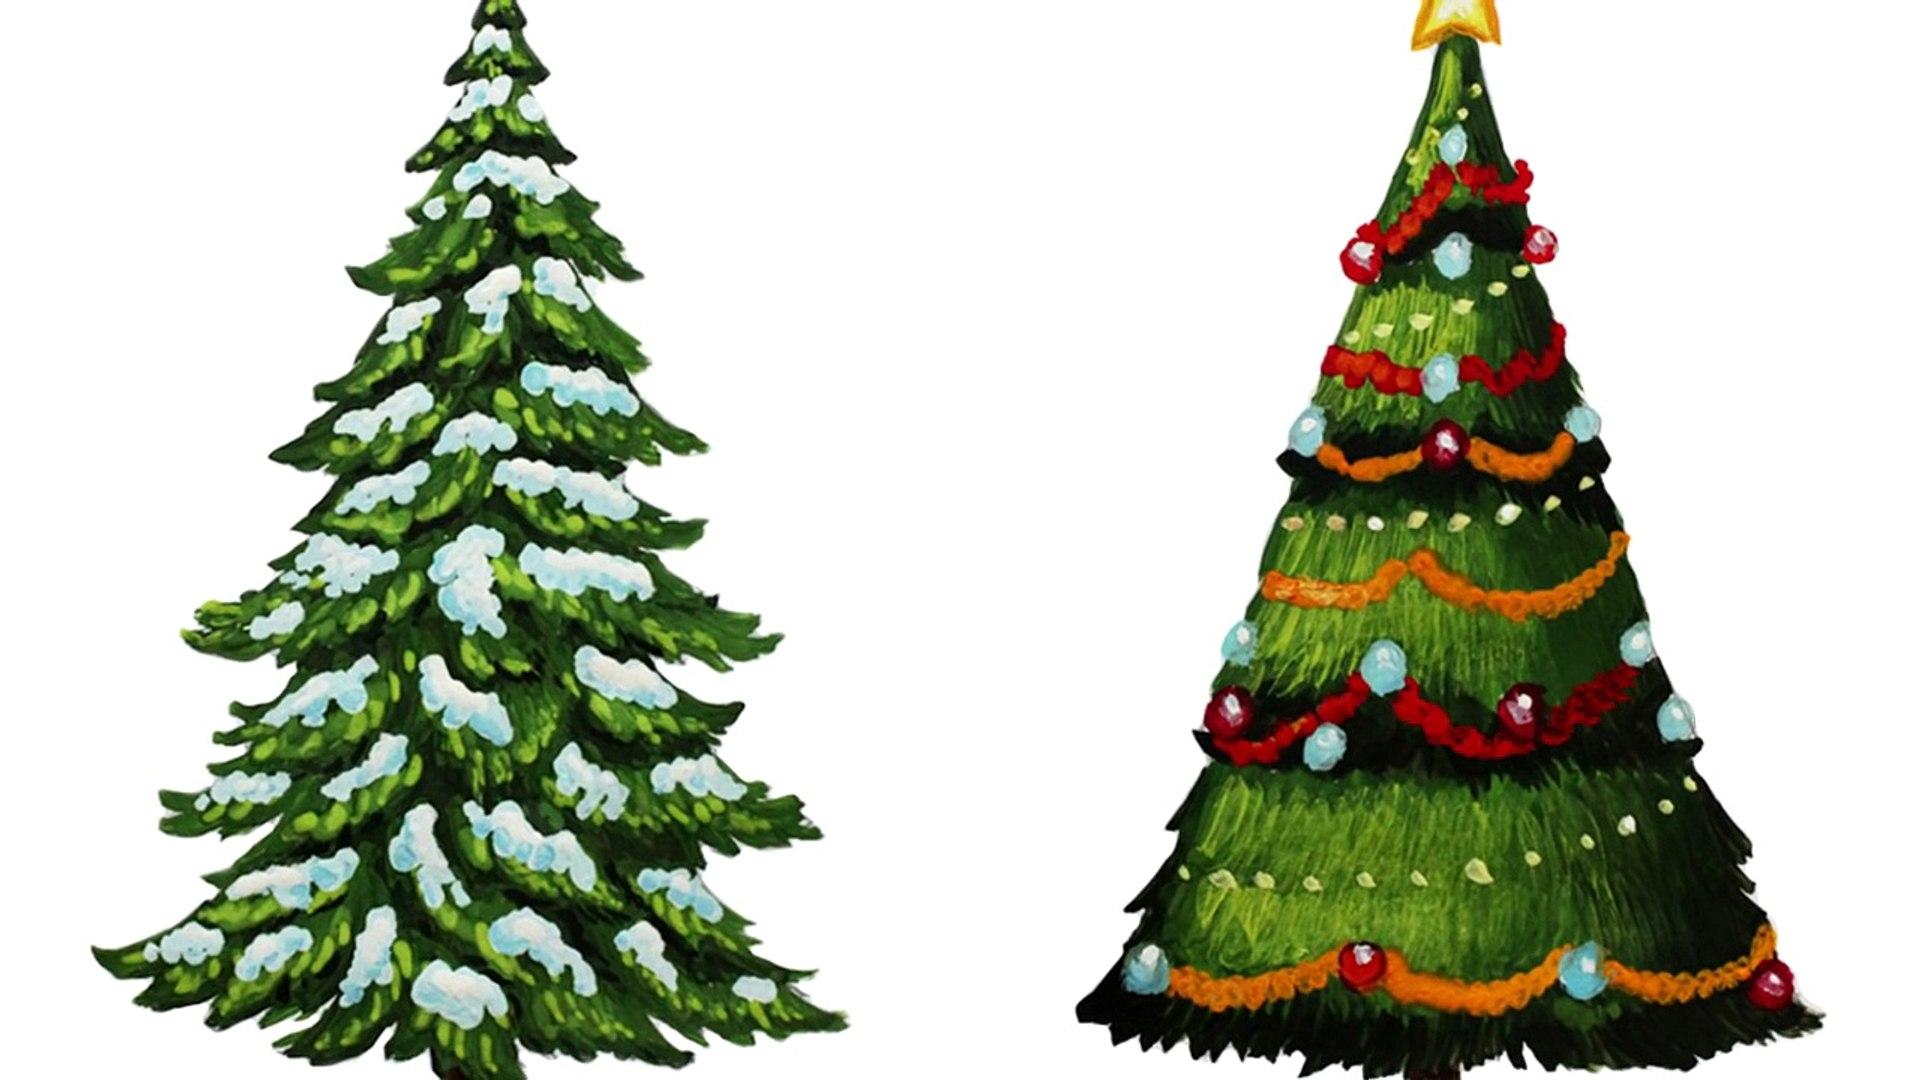 Уроки рисования. Как нарисовать елку. Ель поэтапно - How to draw Christmas Tree with Presents